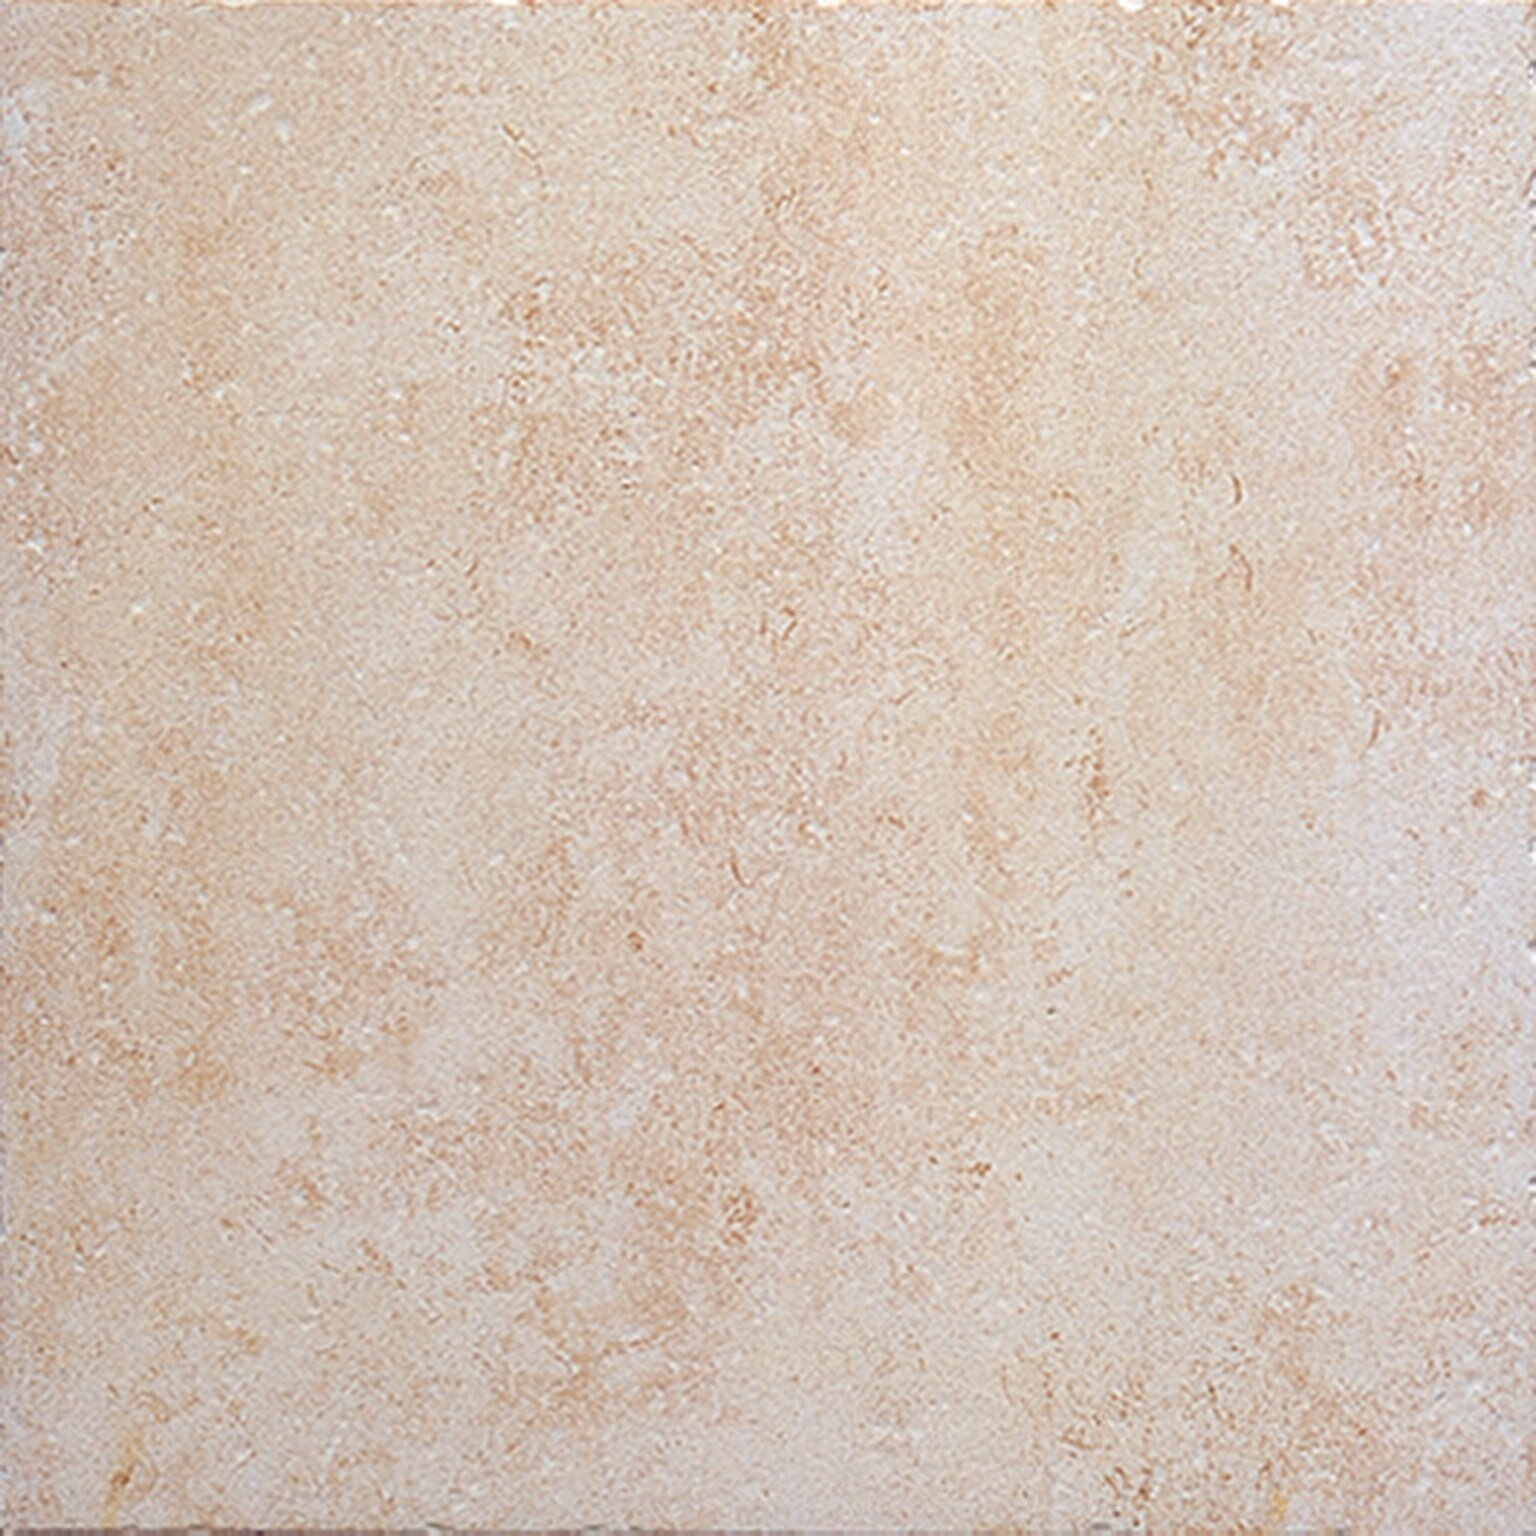 Interceramic montreaux 18 x 18 ceramic field tile in for 18 x 18 tile floor